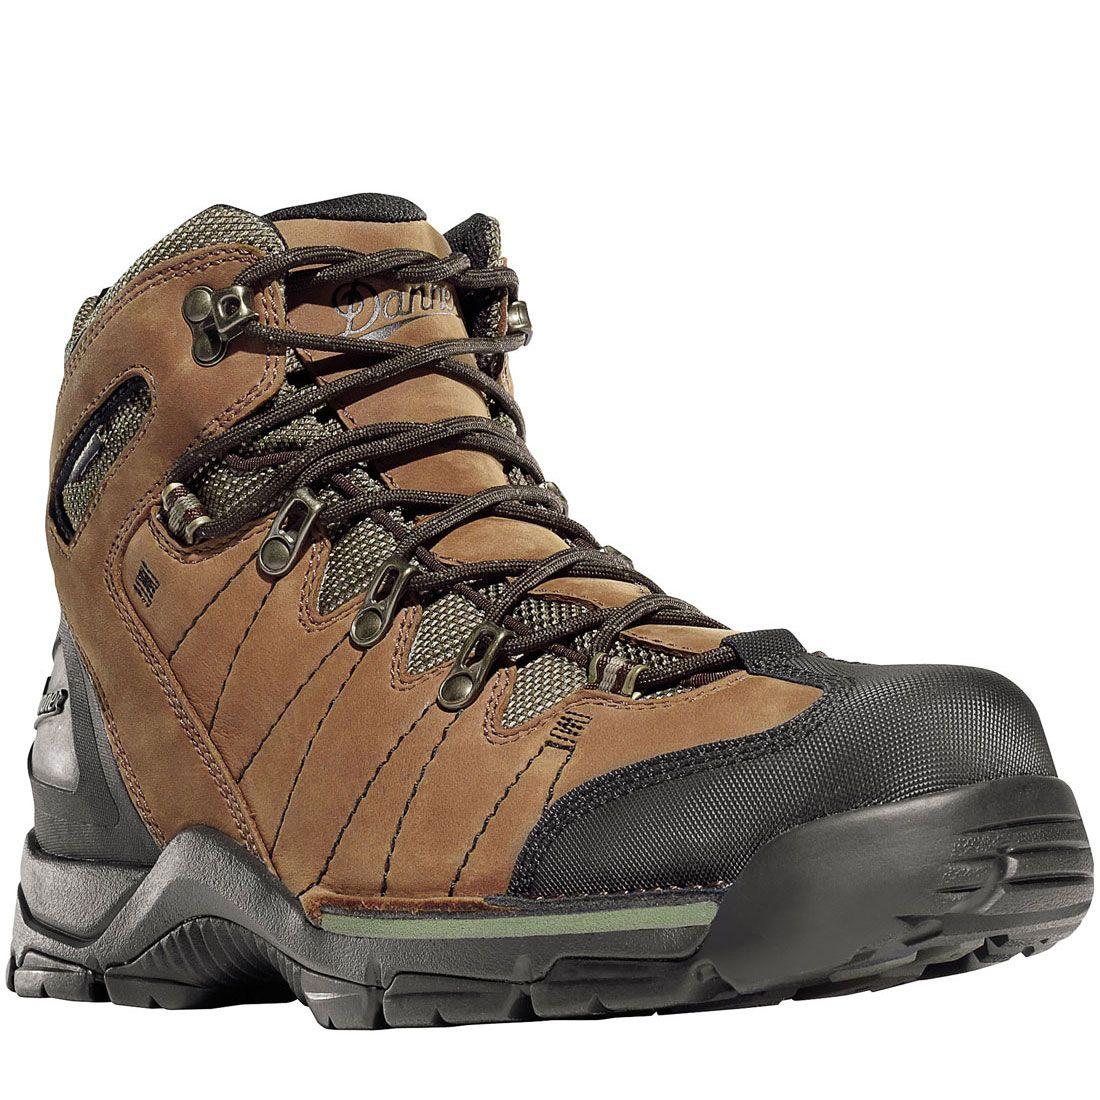 37480 Danner Men's Mt Defiance GTX Hiking Boots - Tan